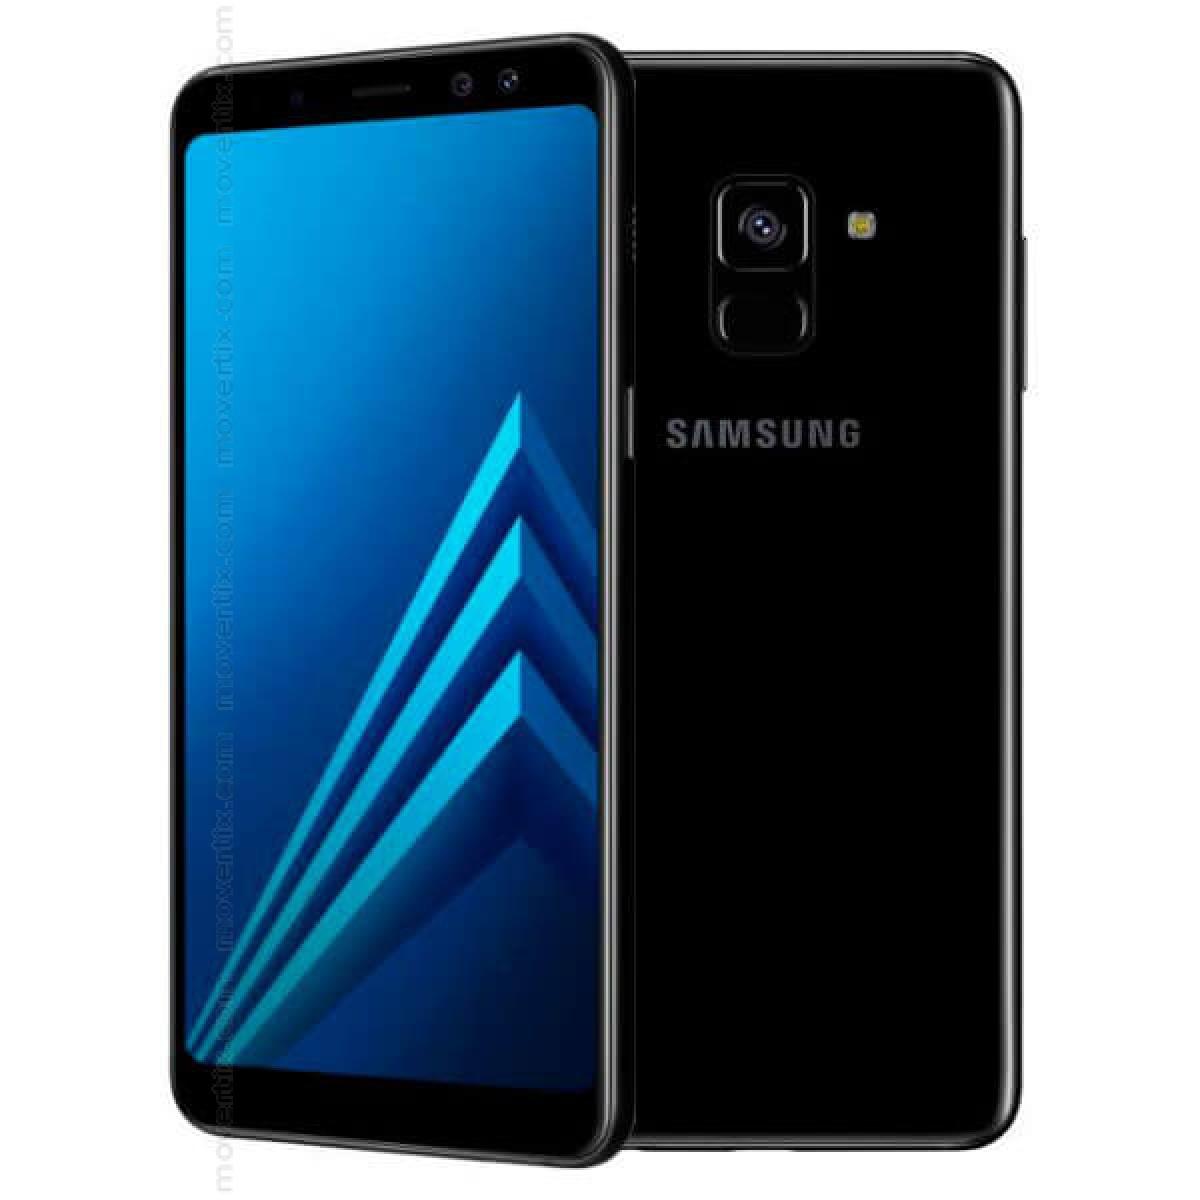 Samsung Galaxy A8 (2018) Dual SIM Black 32GB - SM-A530 (8850007057376) | Movertix Mobile Phones Shop